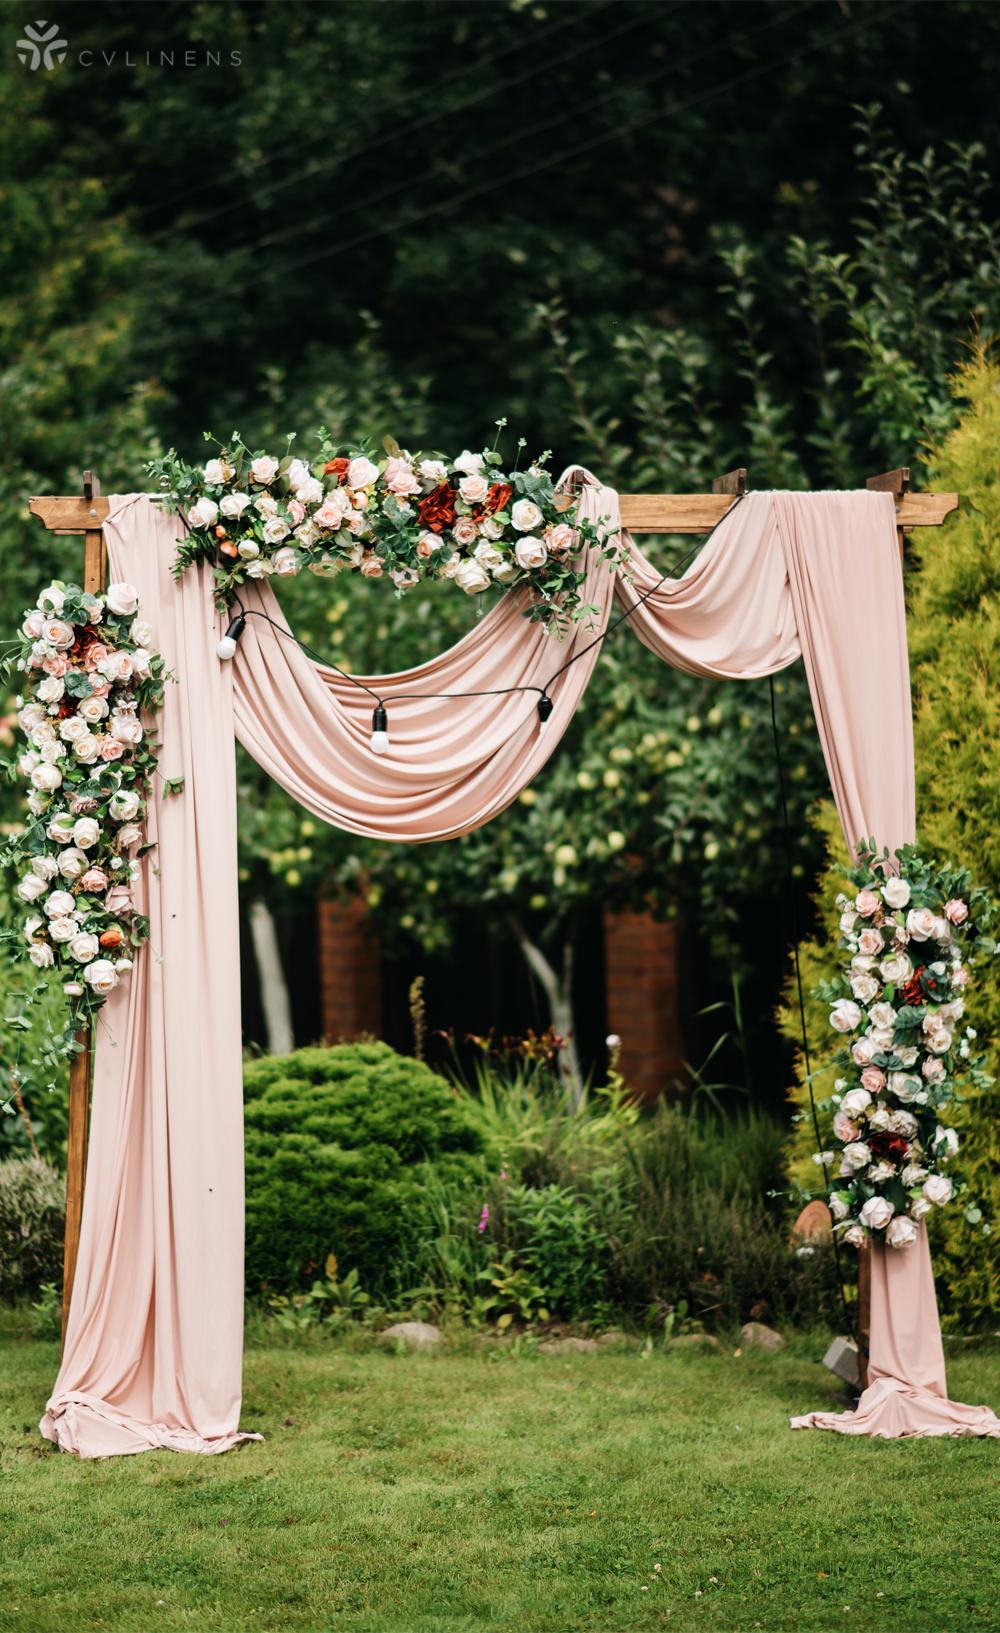 Chiffon Fabric Bolt 58 X 10 Yards Dusty Rose Mauve In 2020 Wedding Arch Flowers Blush Wedding Centerpieces Wedding Arches Outdoors